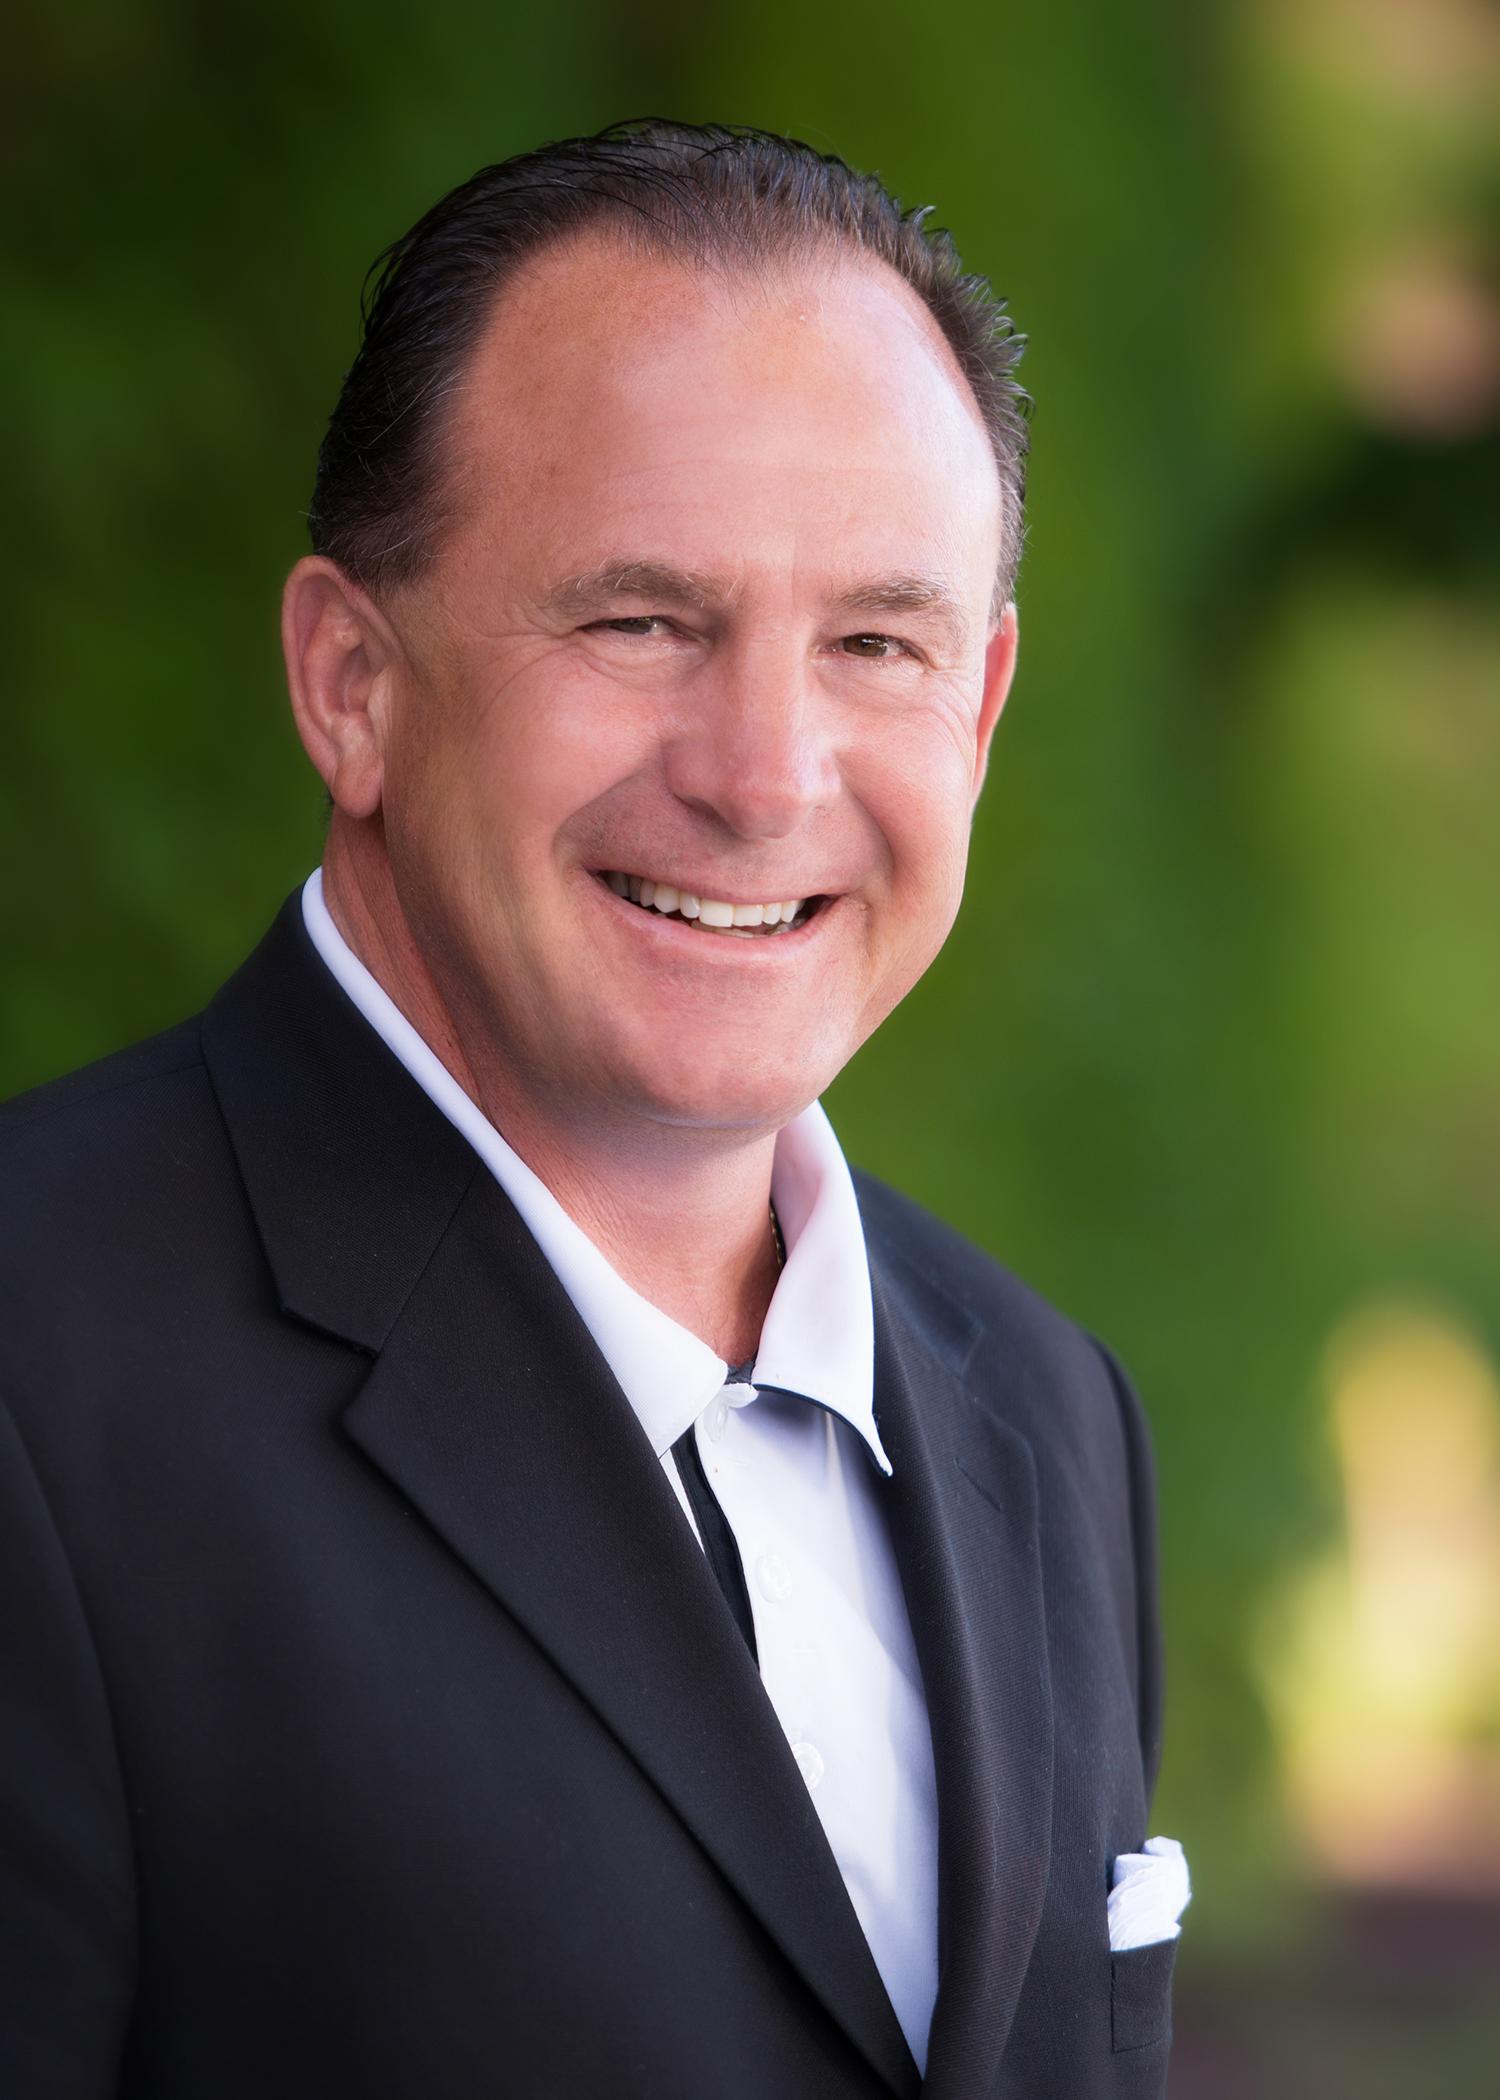 George Bogdonovich, Advisor